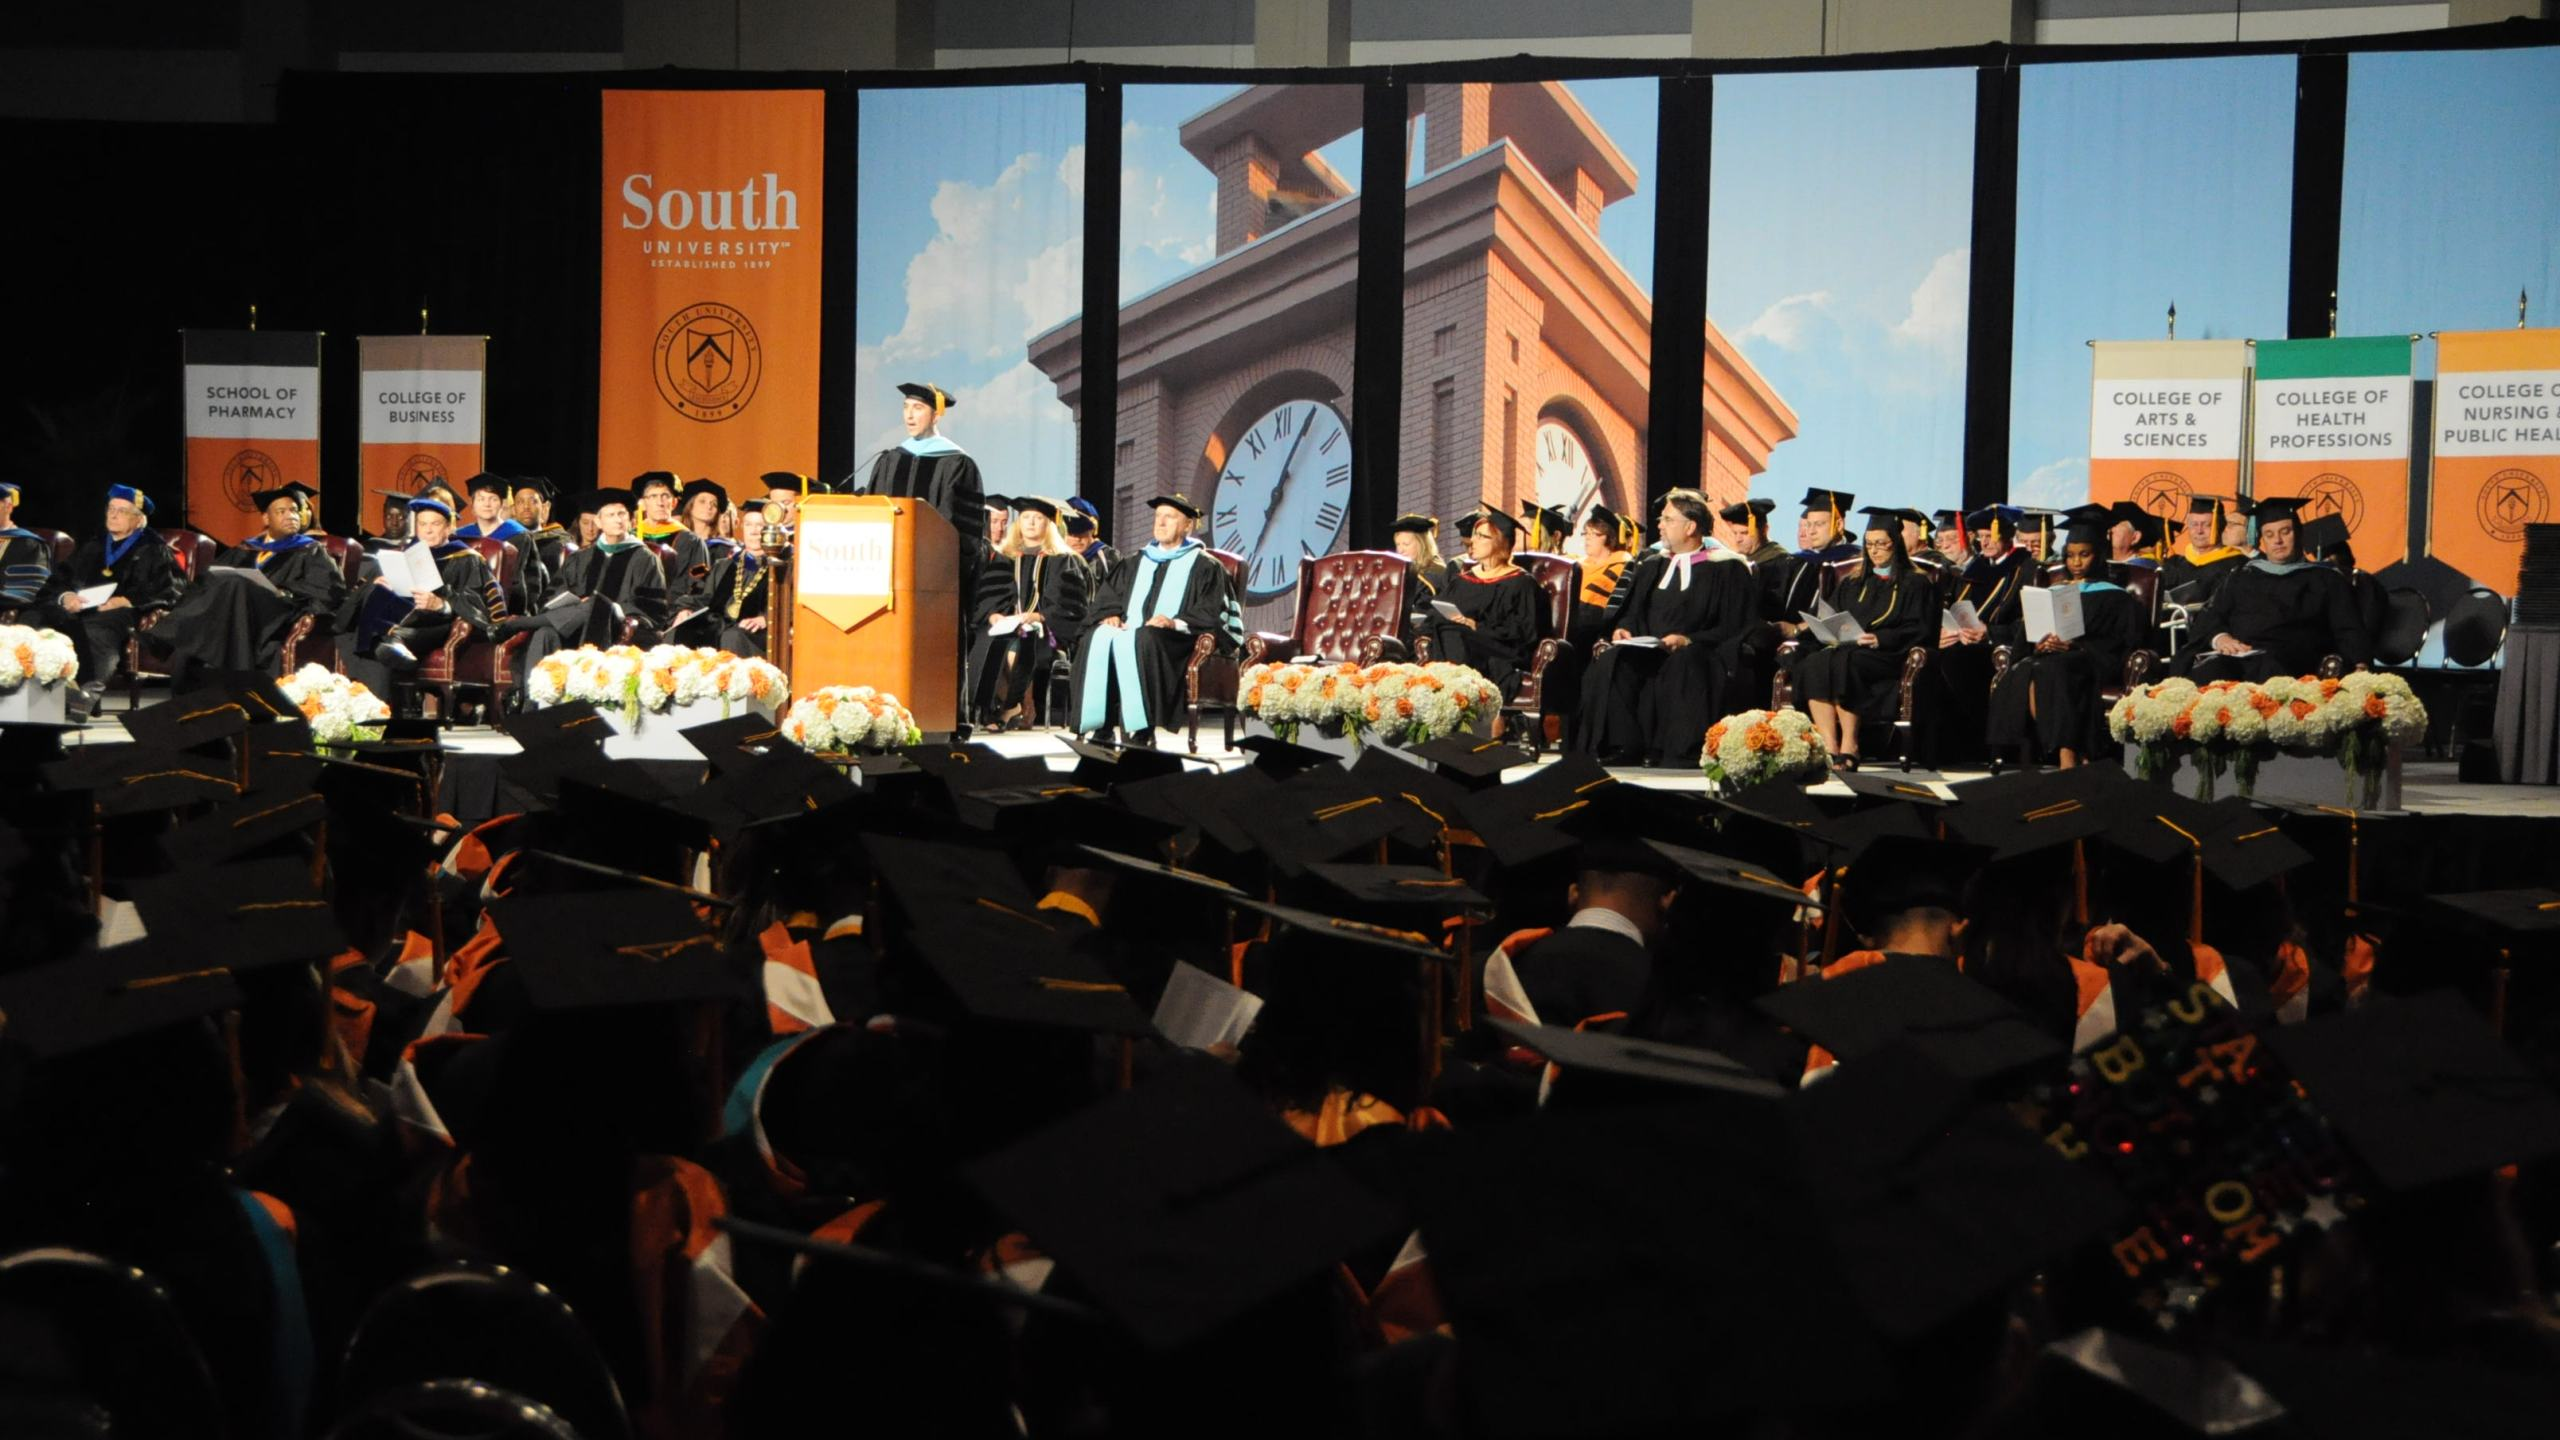 south university pic_4364